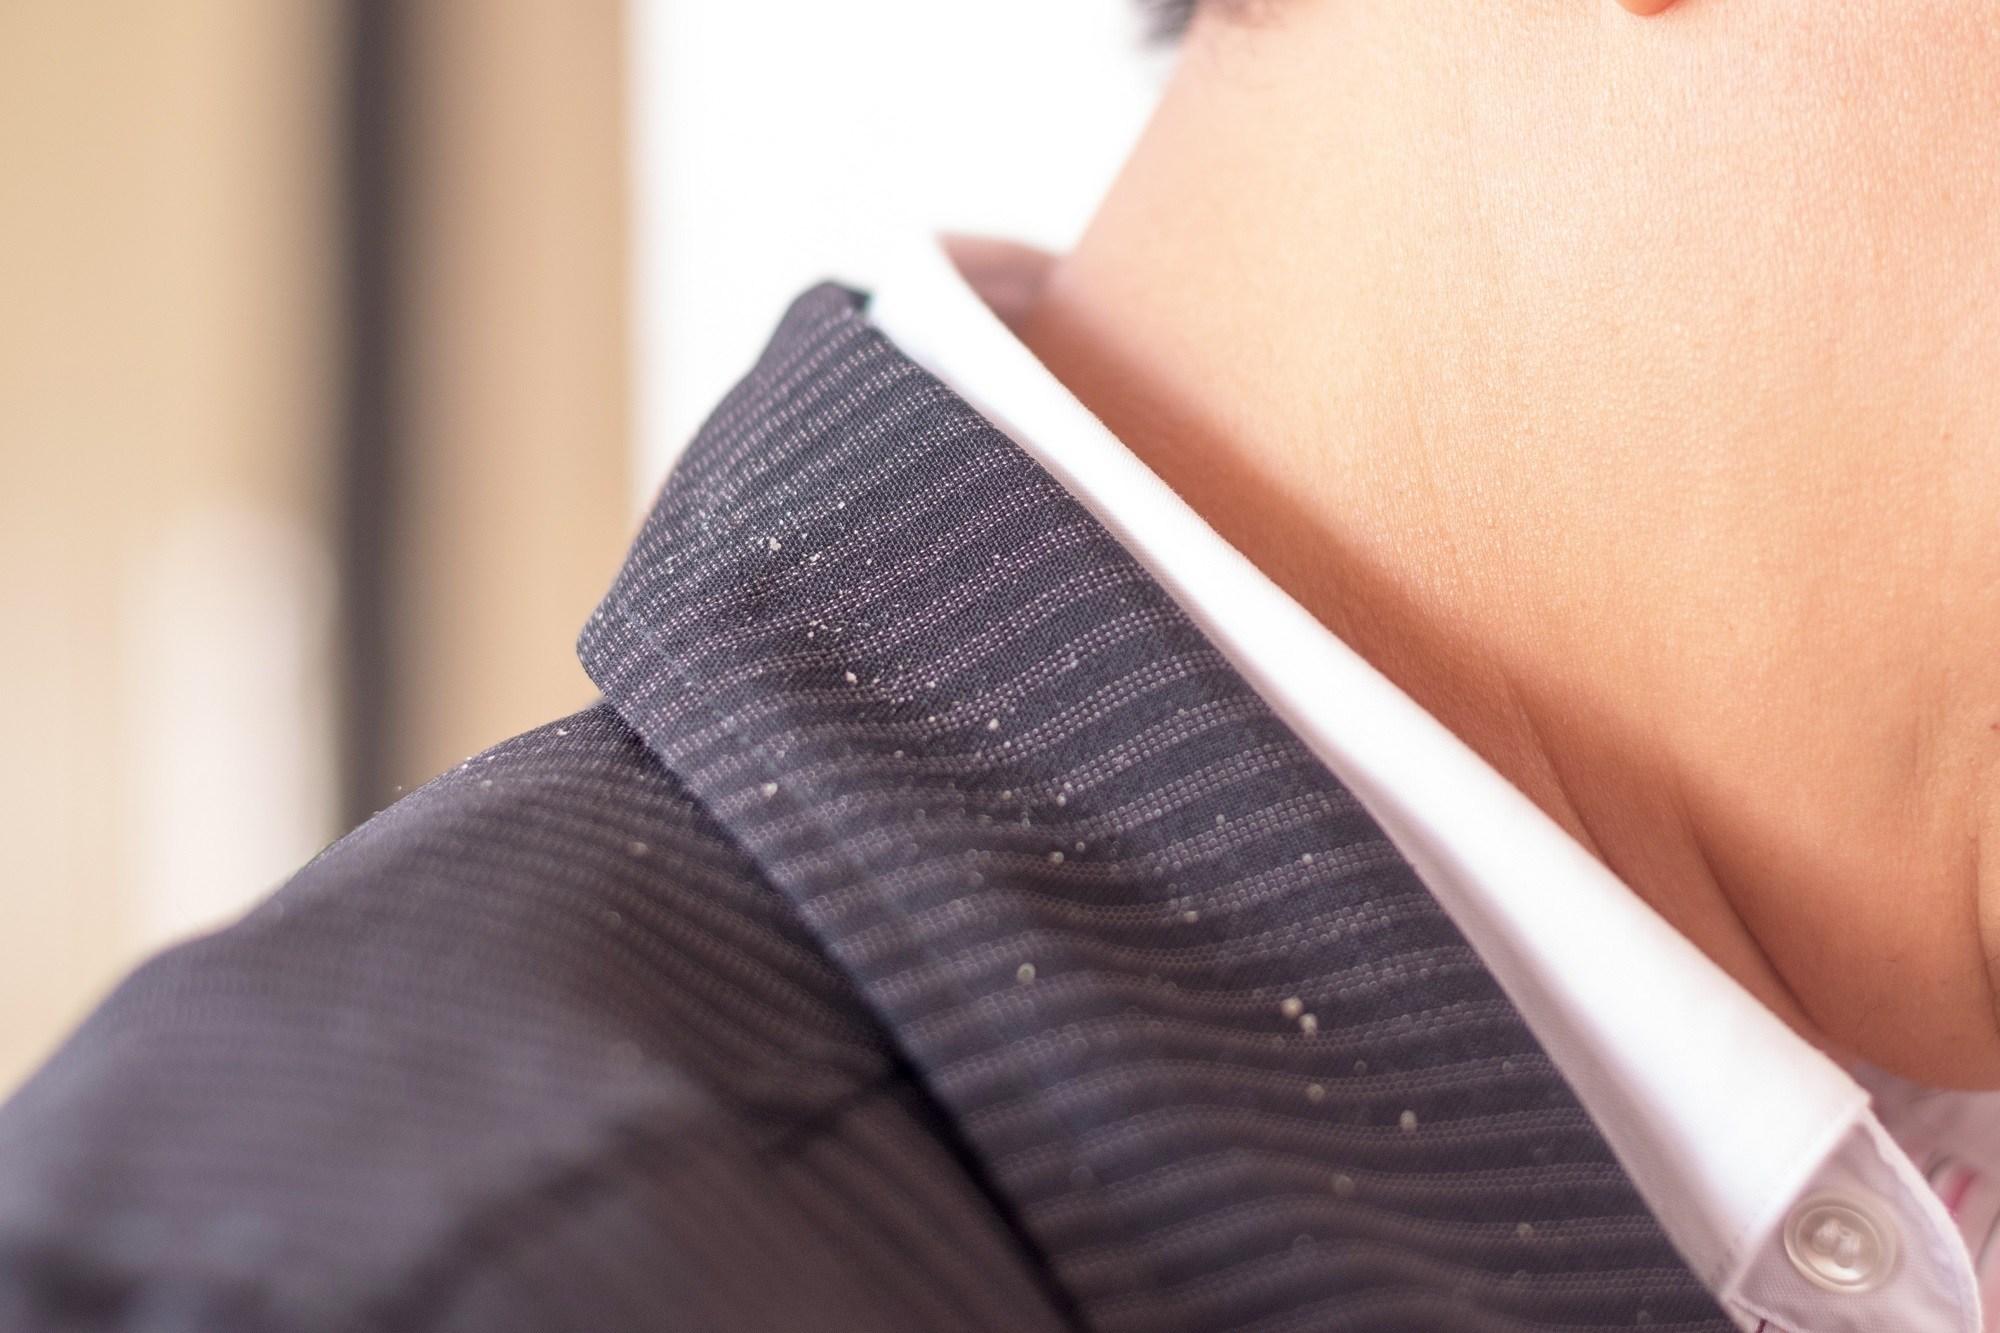 Scalp care for men: Check for white flaes